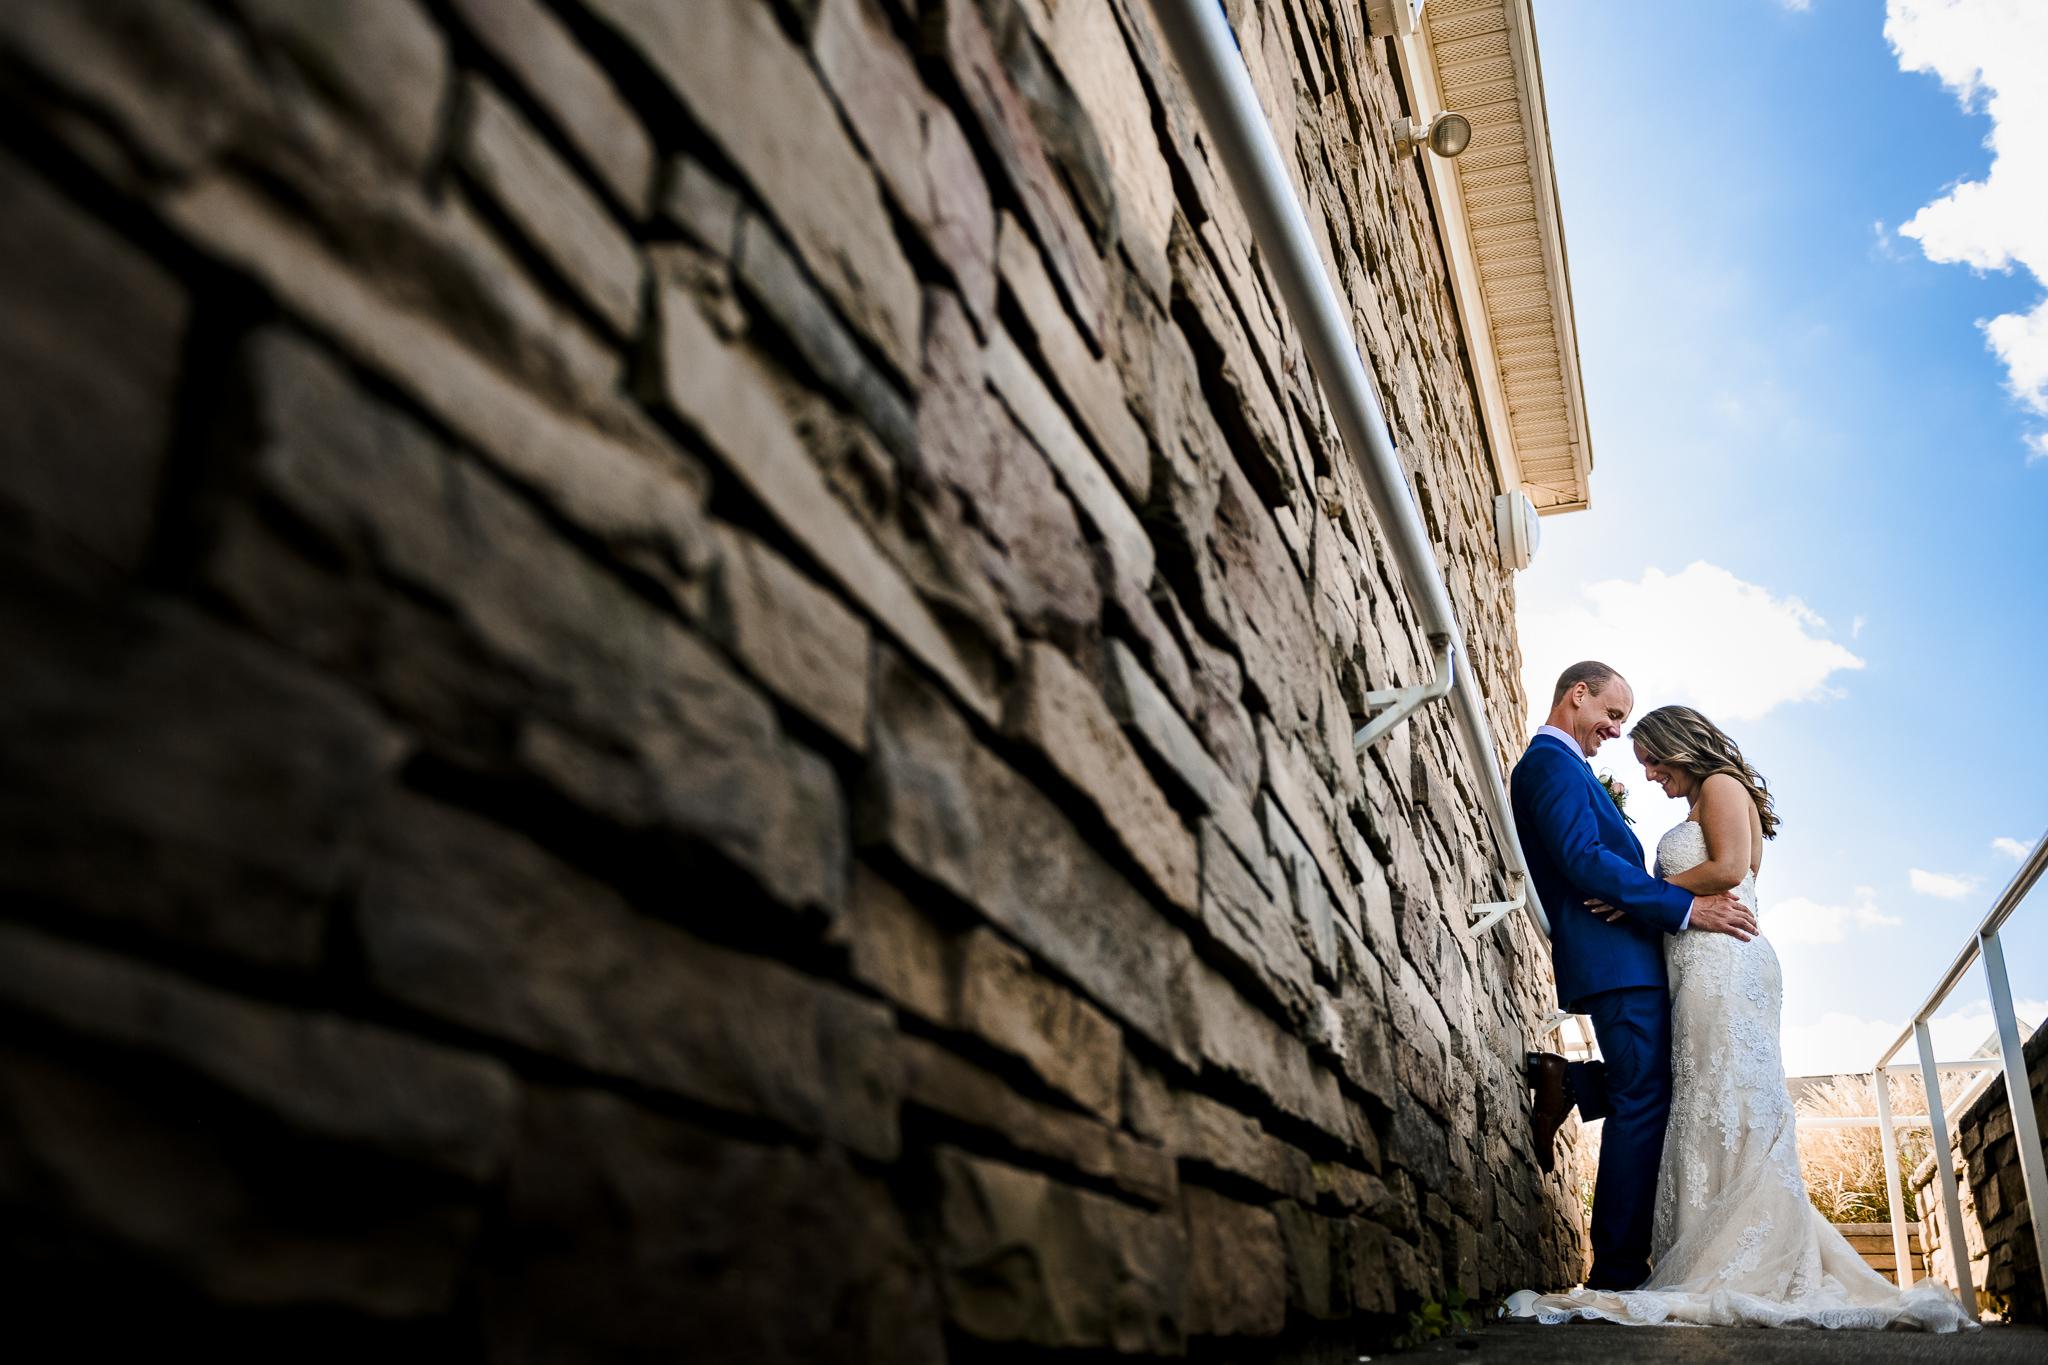 Culos-Sheraton-Eatontown-Long-Branch-Wedding-Photographer-07.JPG